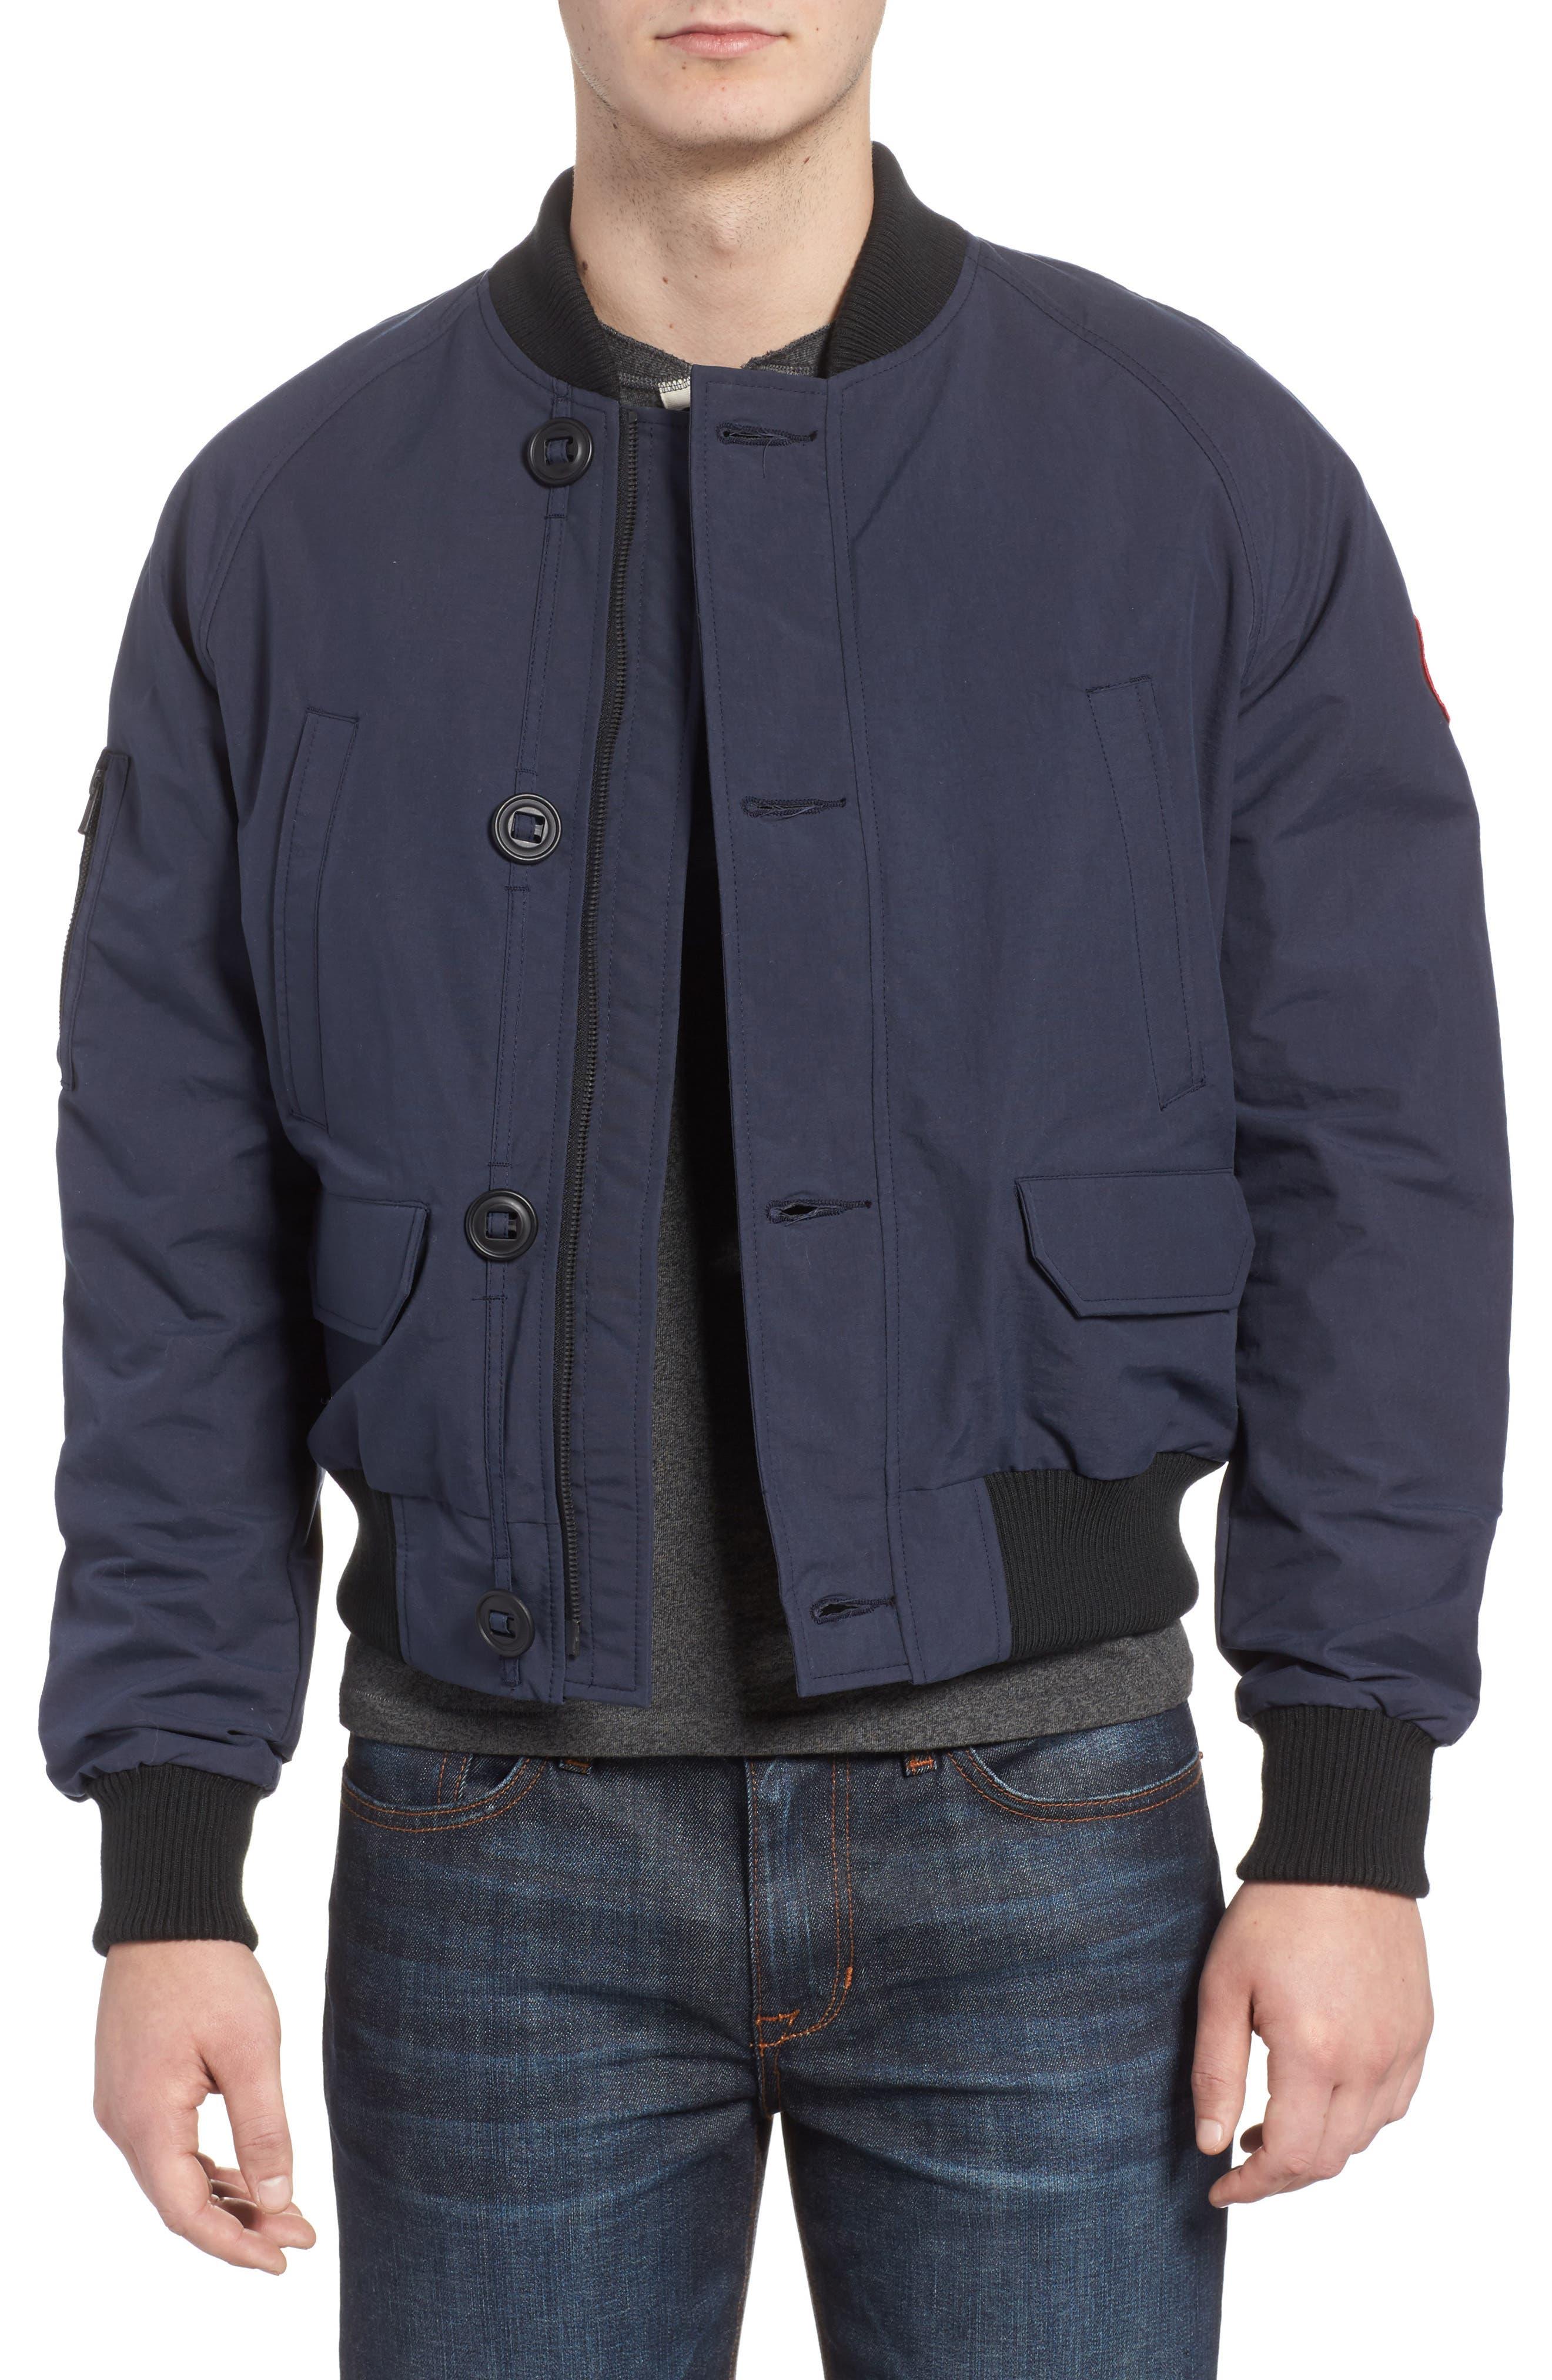 Faber Slim Fit Bomber Jacket,                             Main thumbnail 1, color,                             400